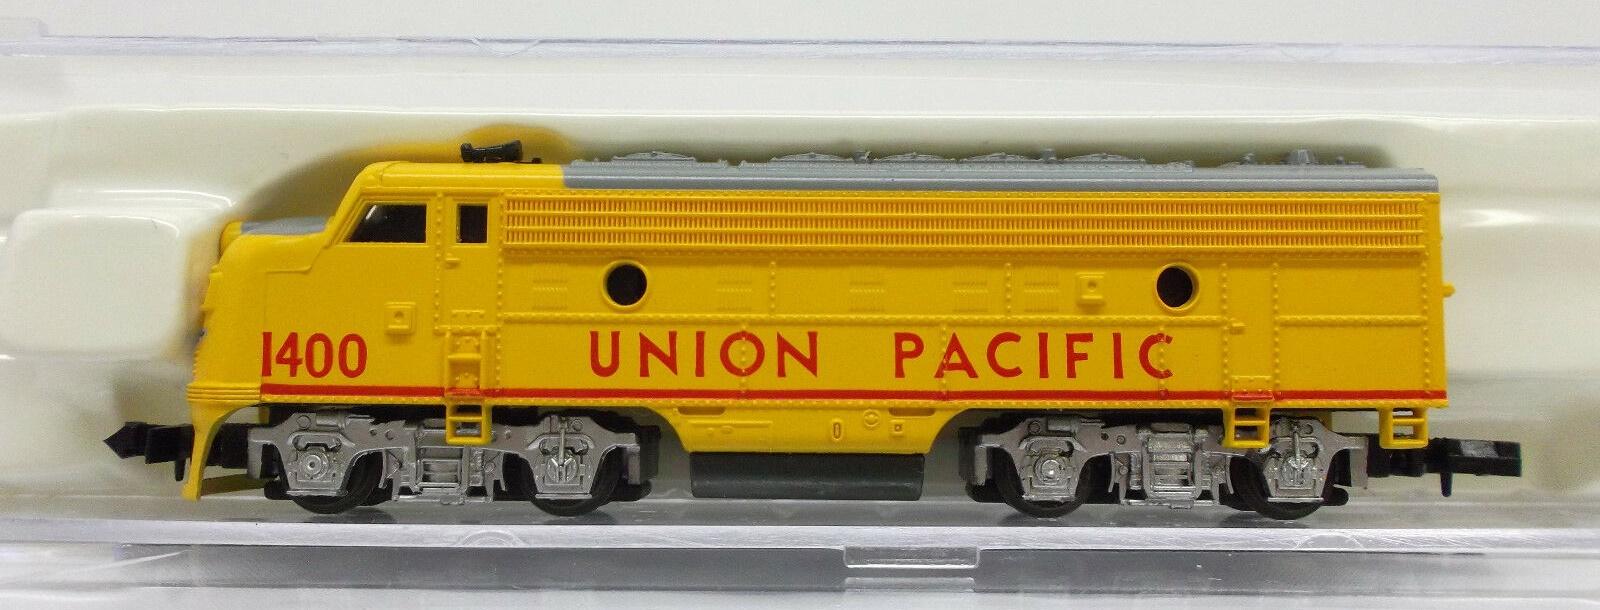 N Scale - Life-Like - 7752 - Locomotive, Diesel, EMD F7 - Union Pacific - 1400